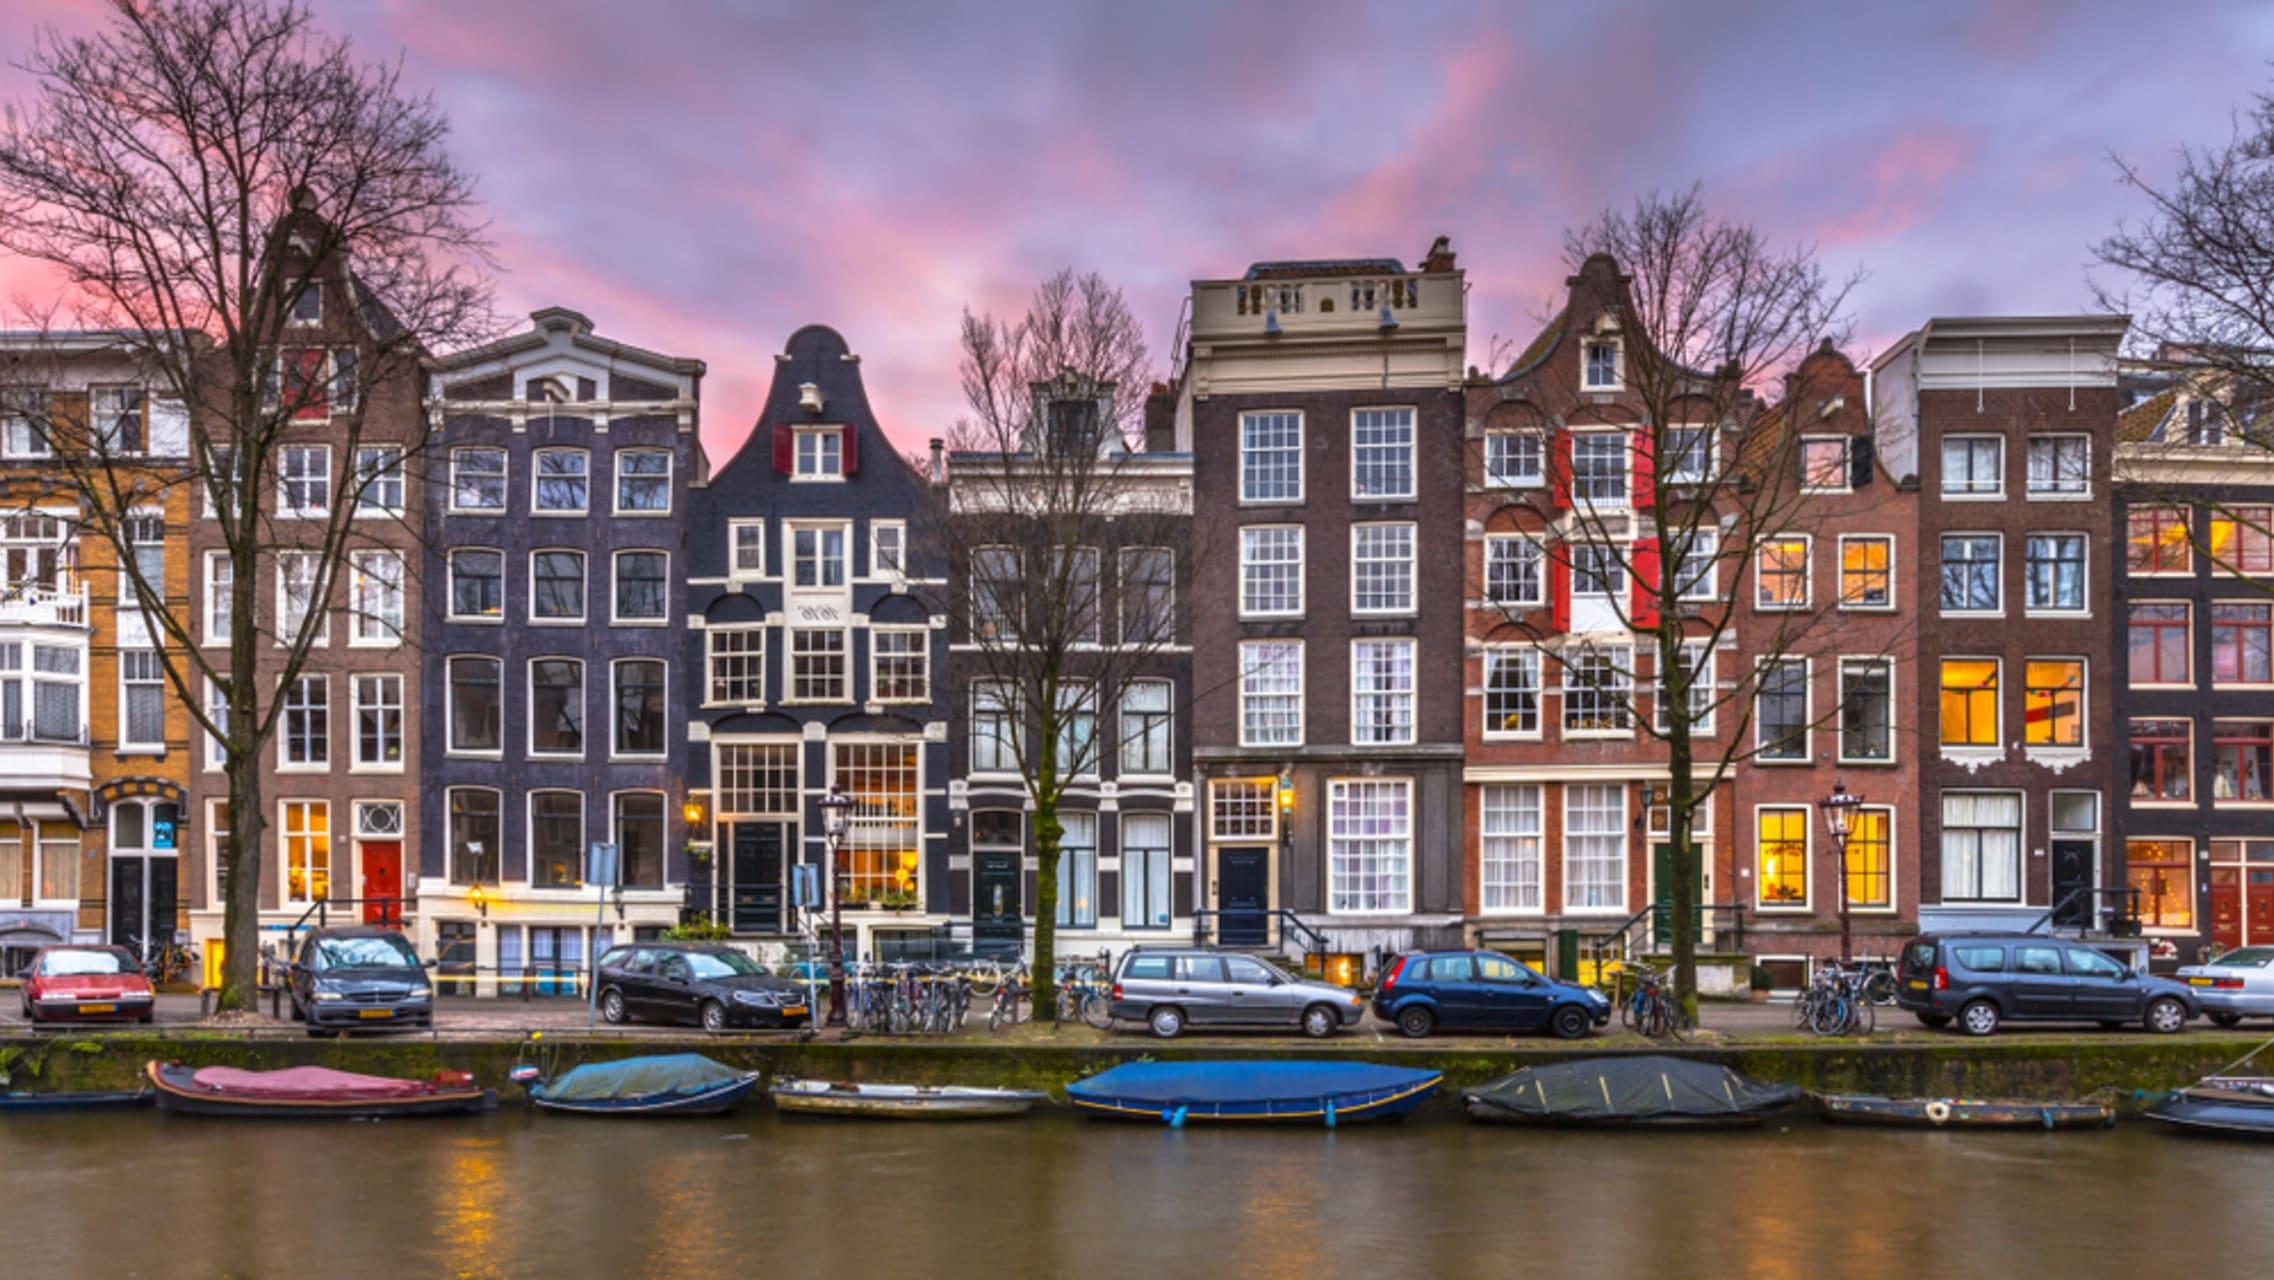 Amsterdam - Explore The Jordaan - Former Slums Of Amsterdam